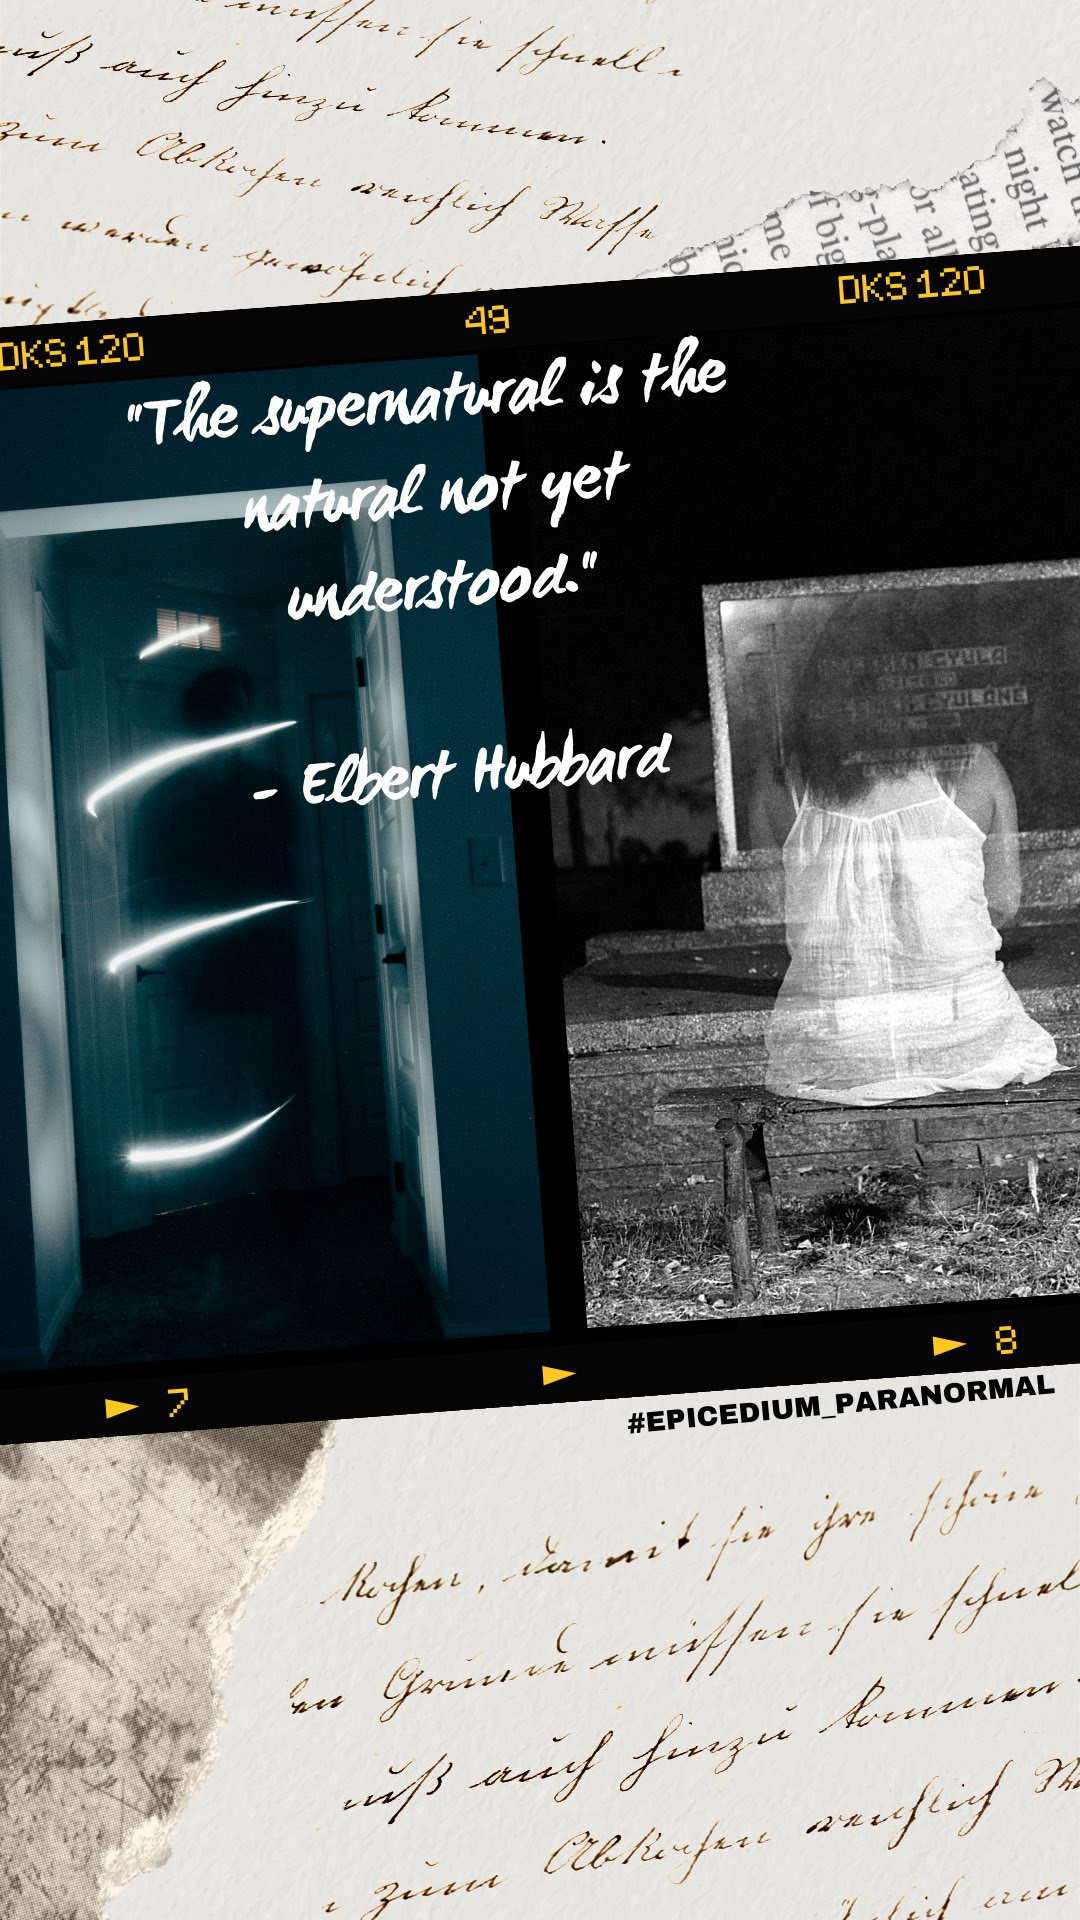 #epicedium_paranormal #epicediumnj #paranormal #paranormalactivity #paranormalinvestigators #misunderstood #paranormalteam #paranormaltravels #paranormaltruth #researchers #professionals #freeservice https://t.co/URbKeo2s1M